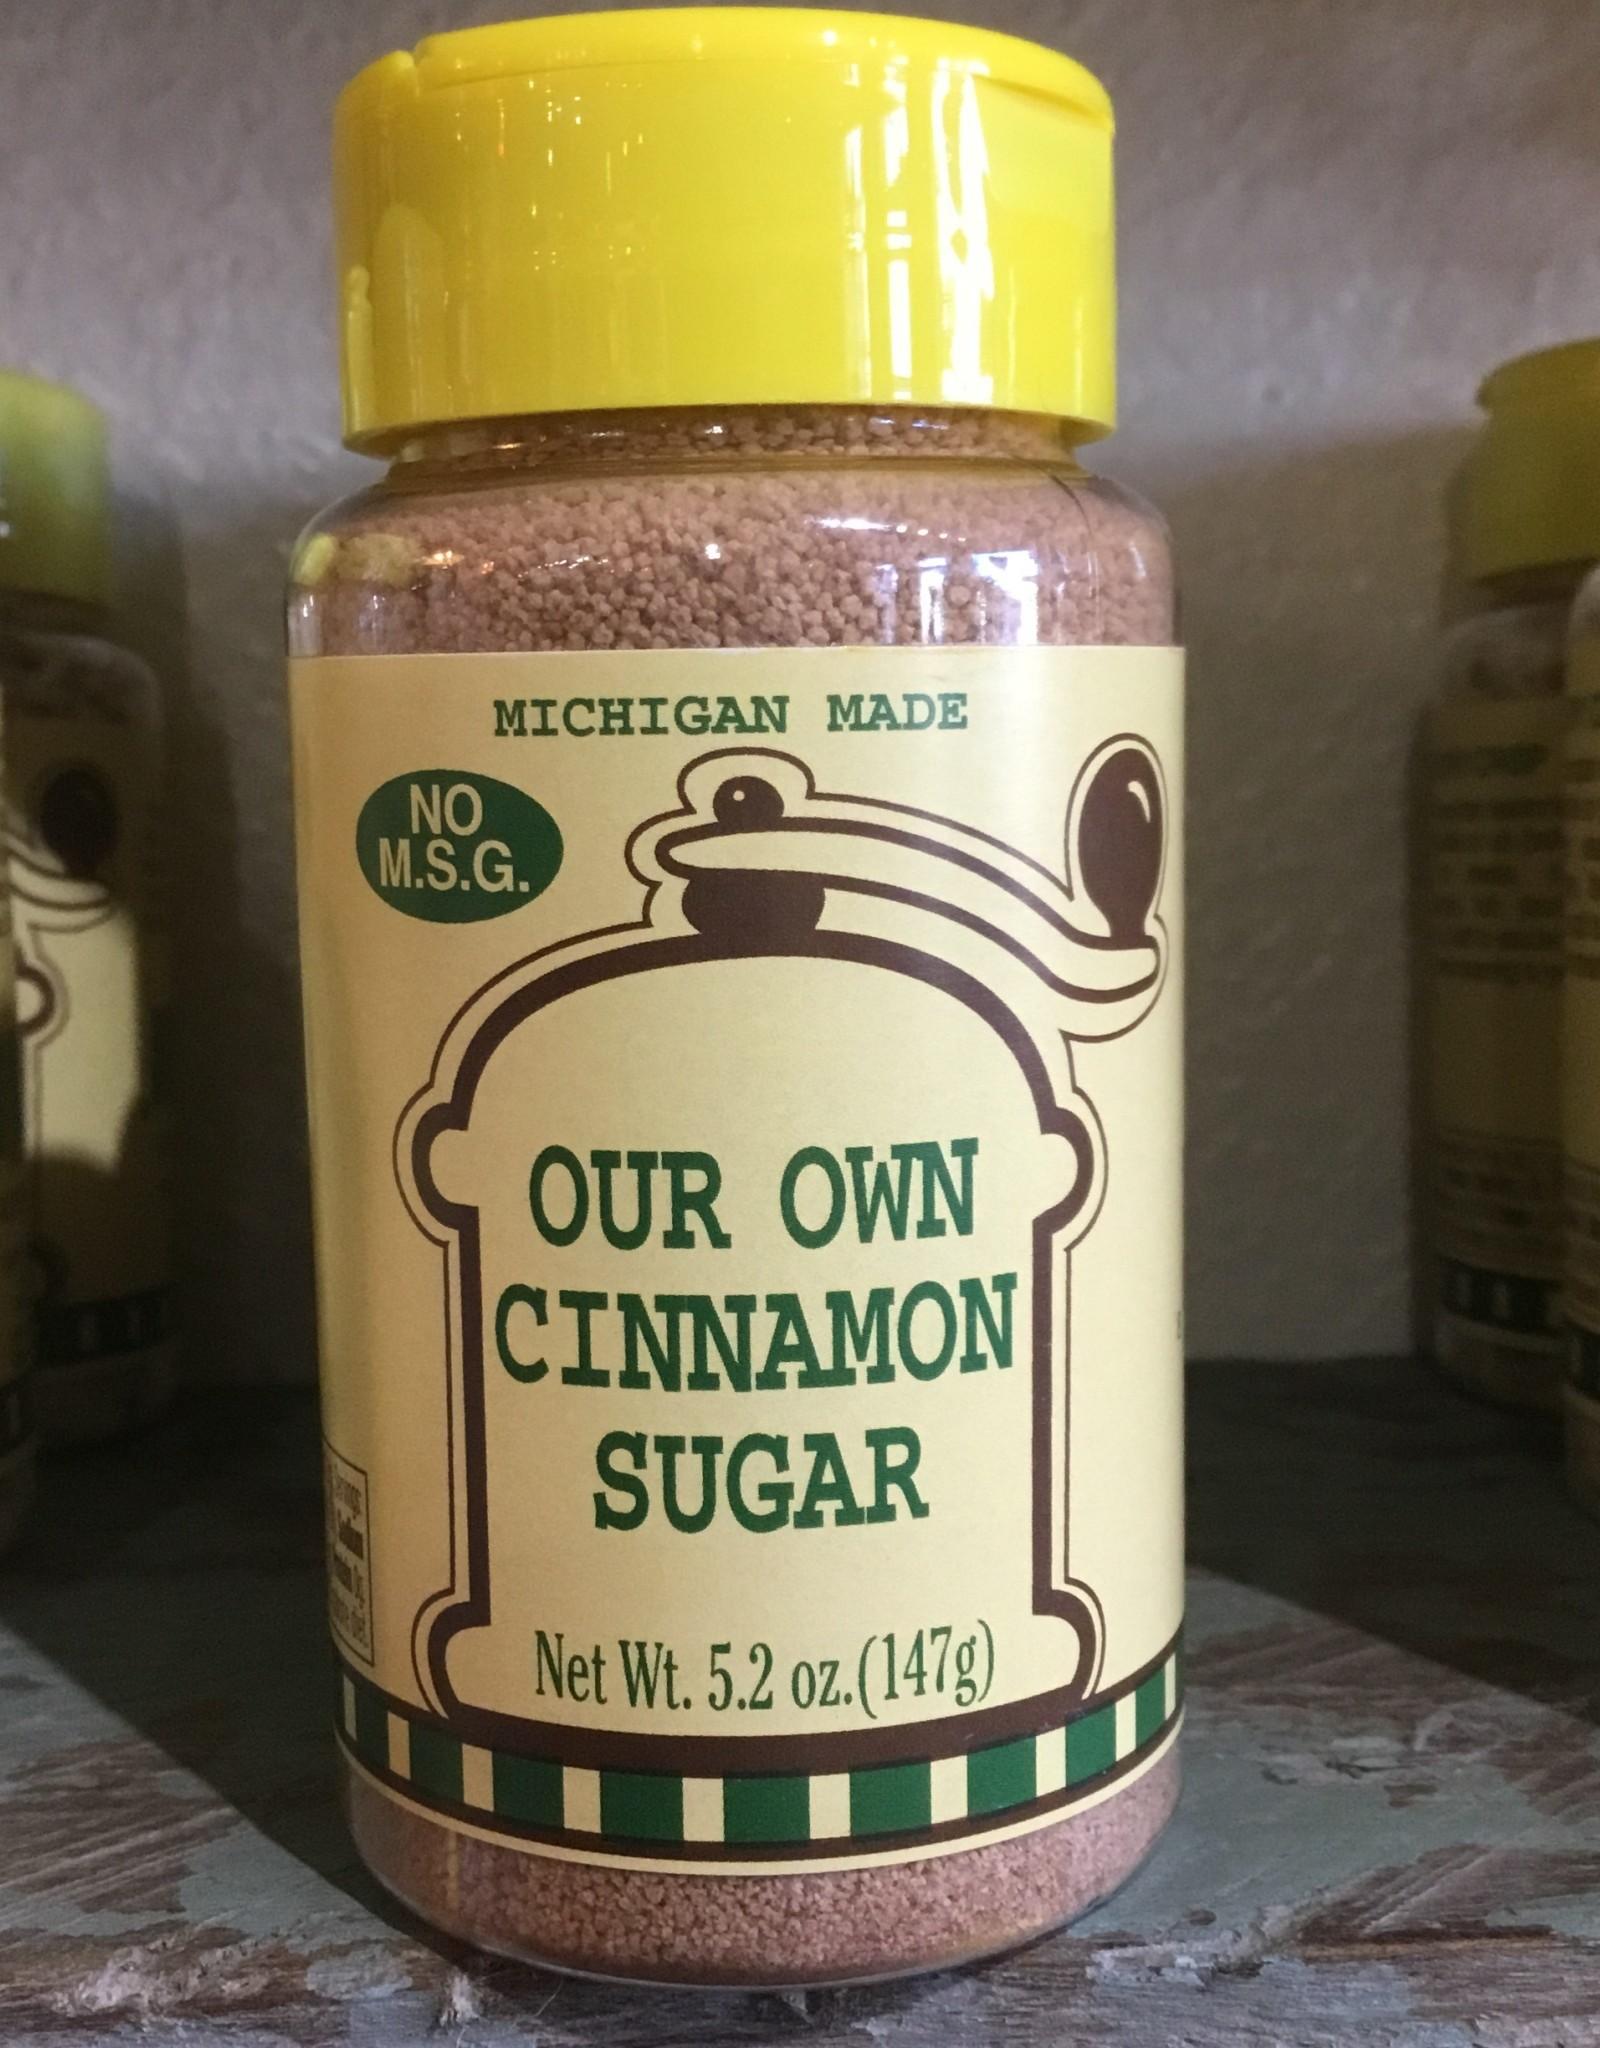 Alden Mill House Gourmet Seasoning Blends & Spices